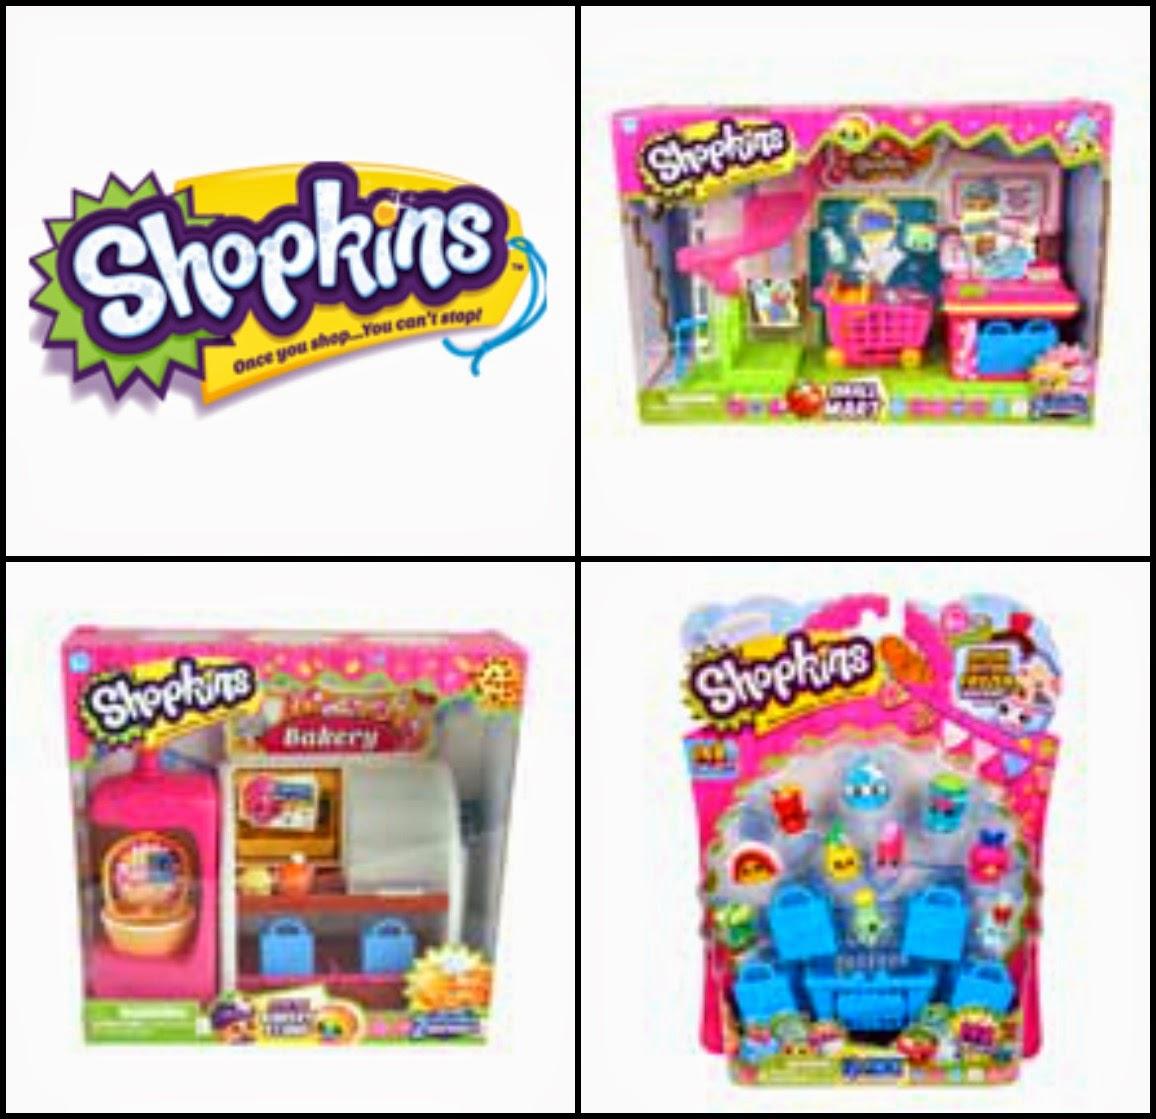 Shopkins giveaway